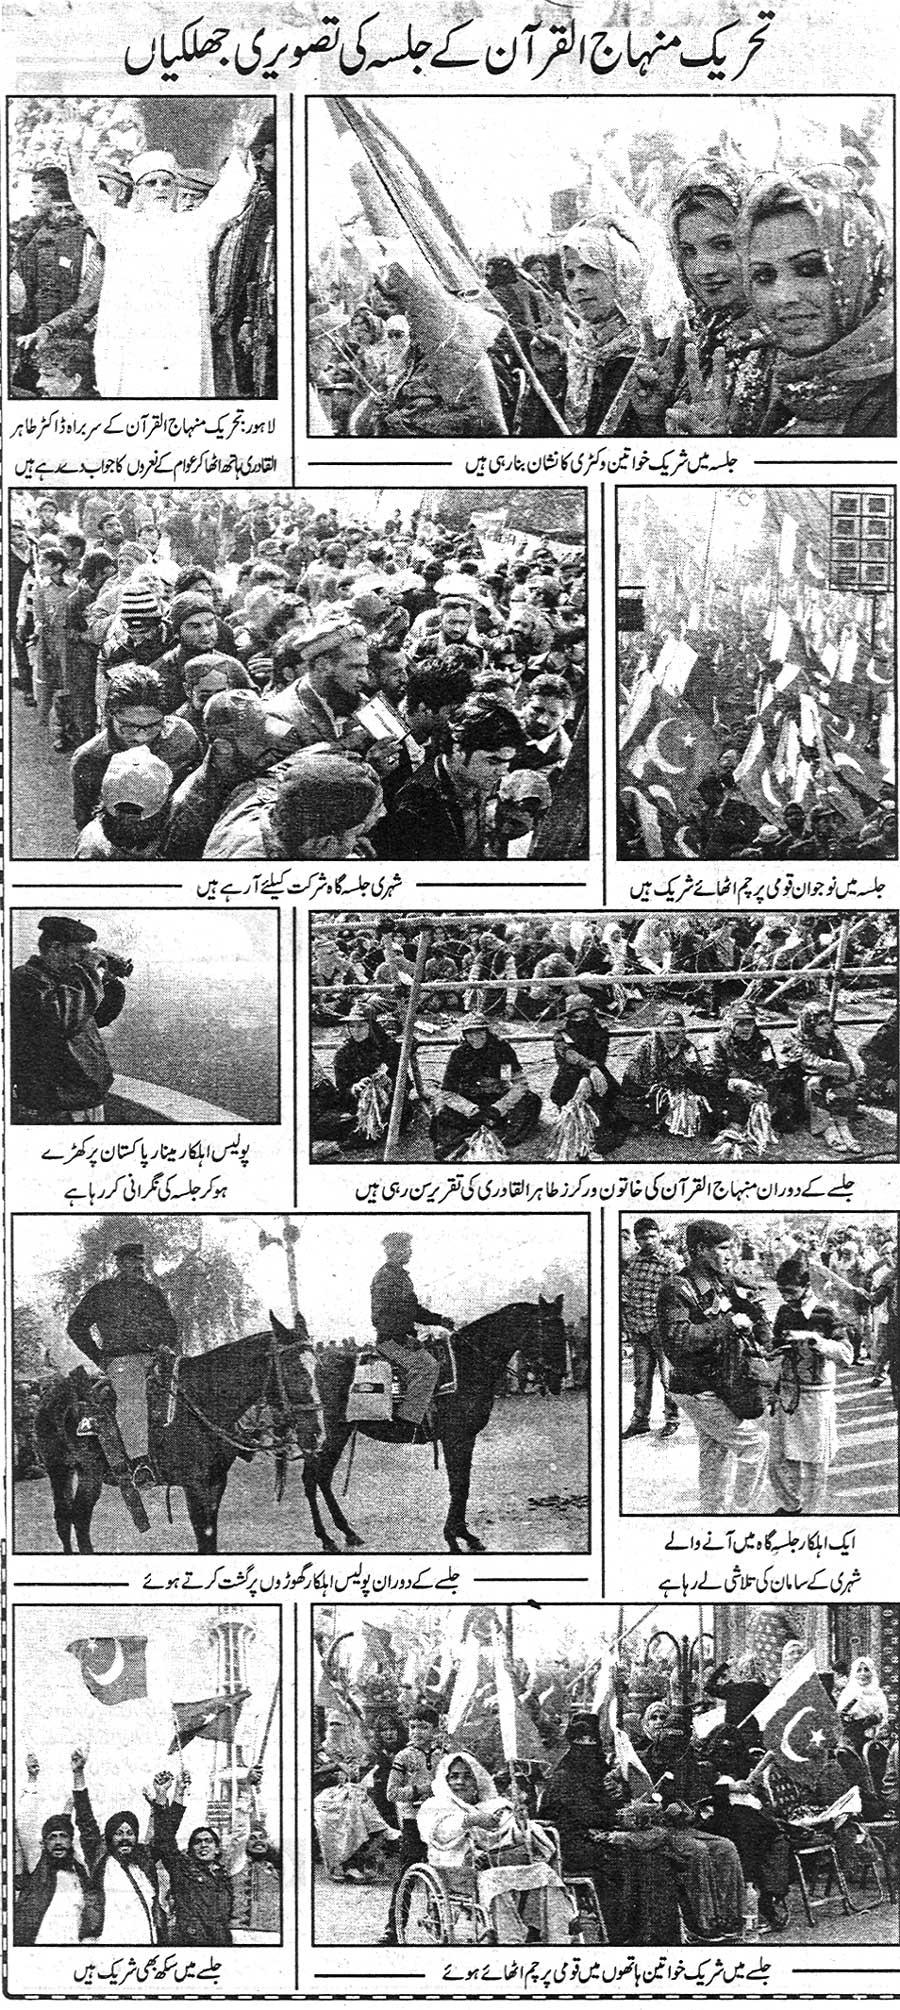 تحریک منہاج القرآن Minhaj-ul-Quran  Print Media Coverage پرنٹ میڈیا کوریج Daily Ash-Sharq